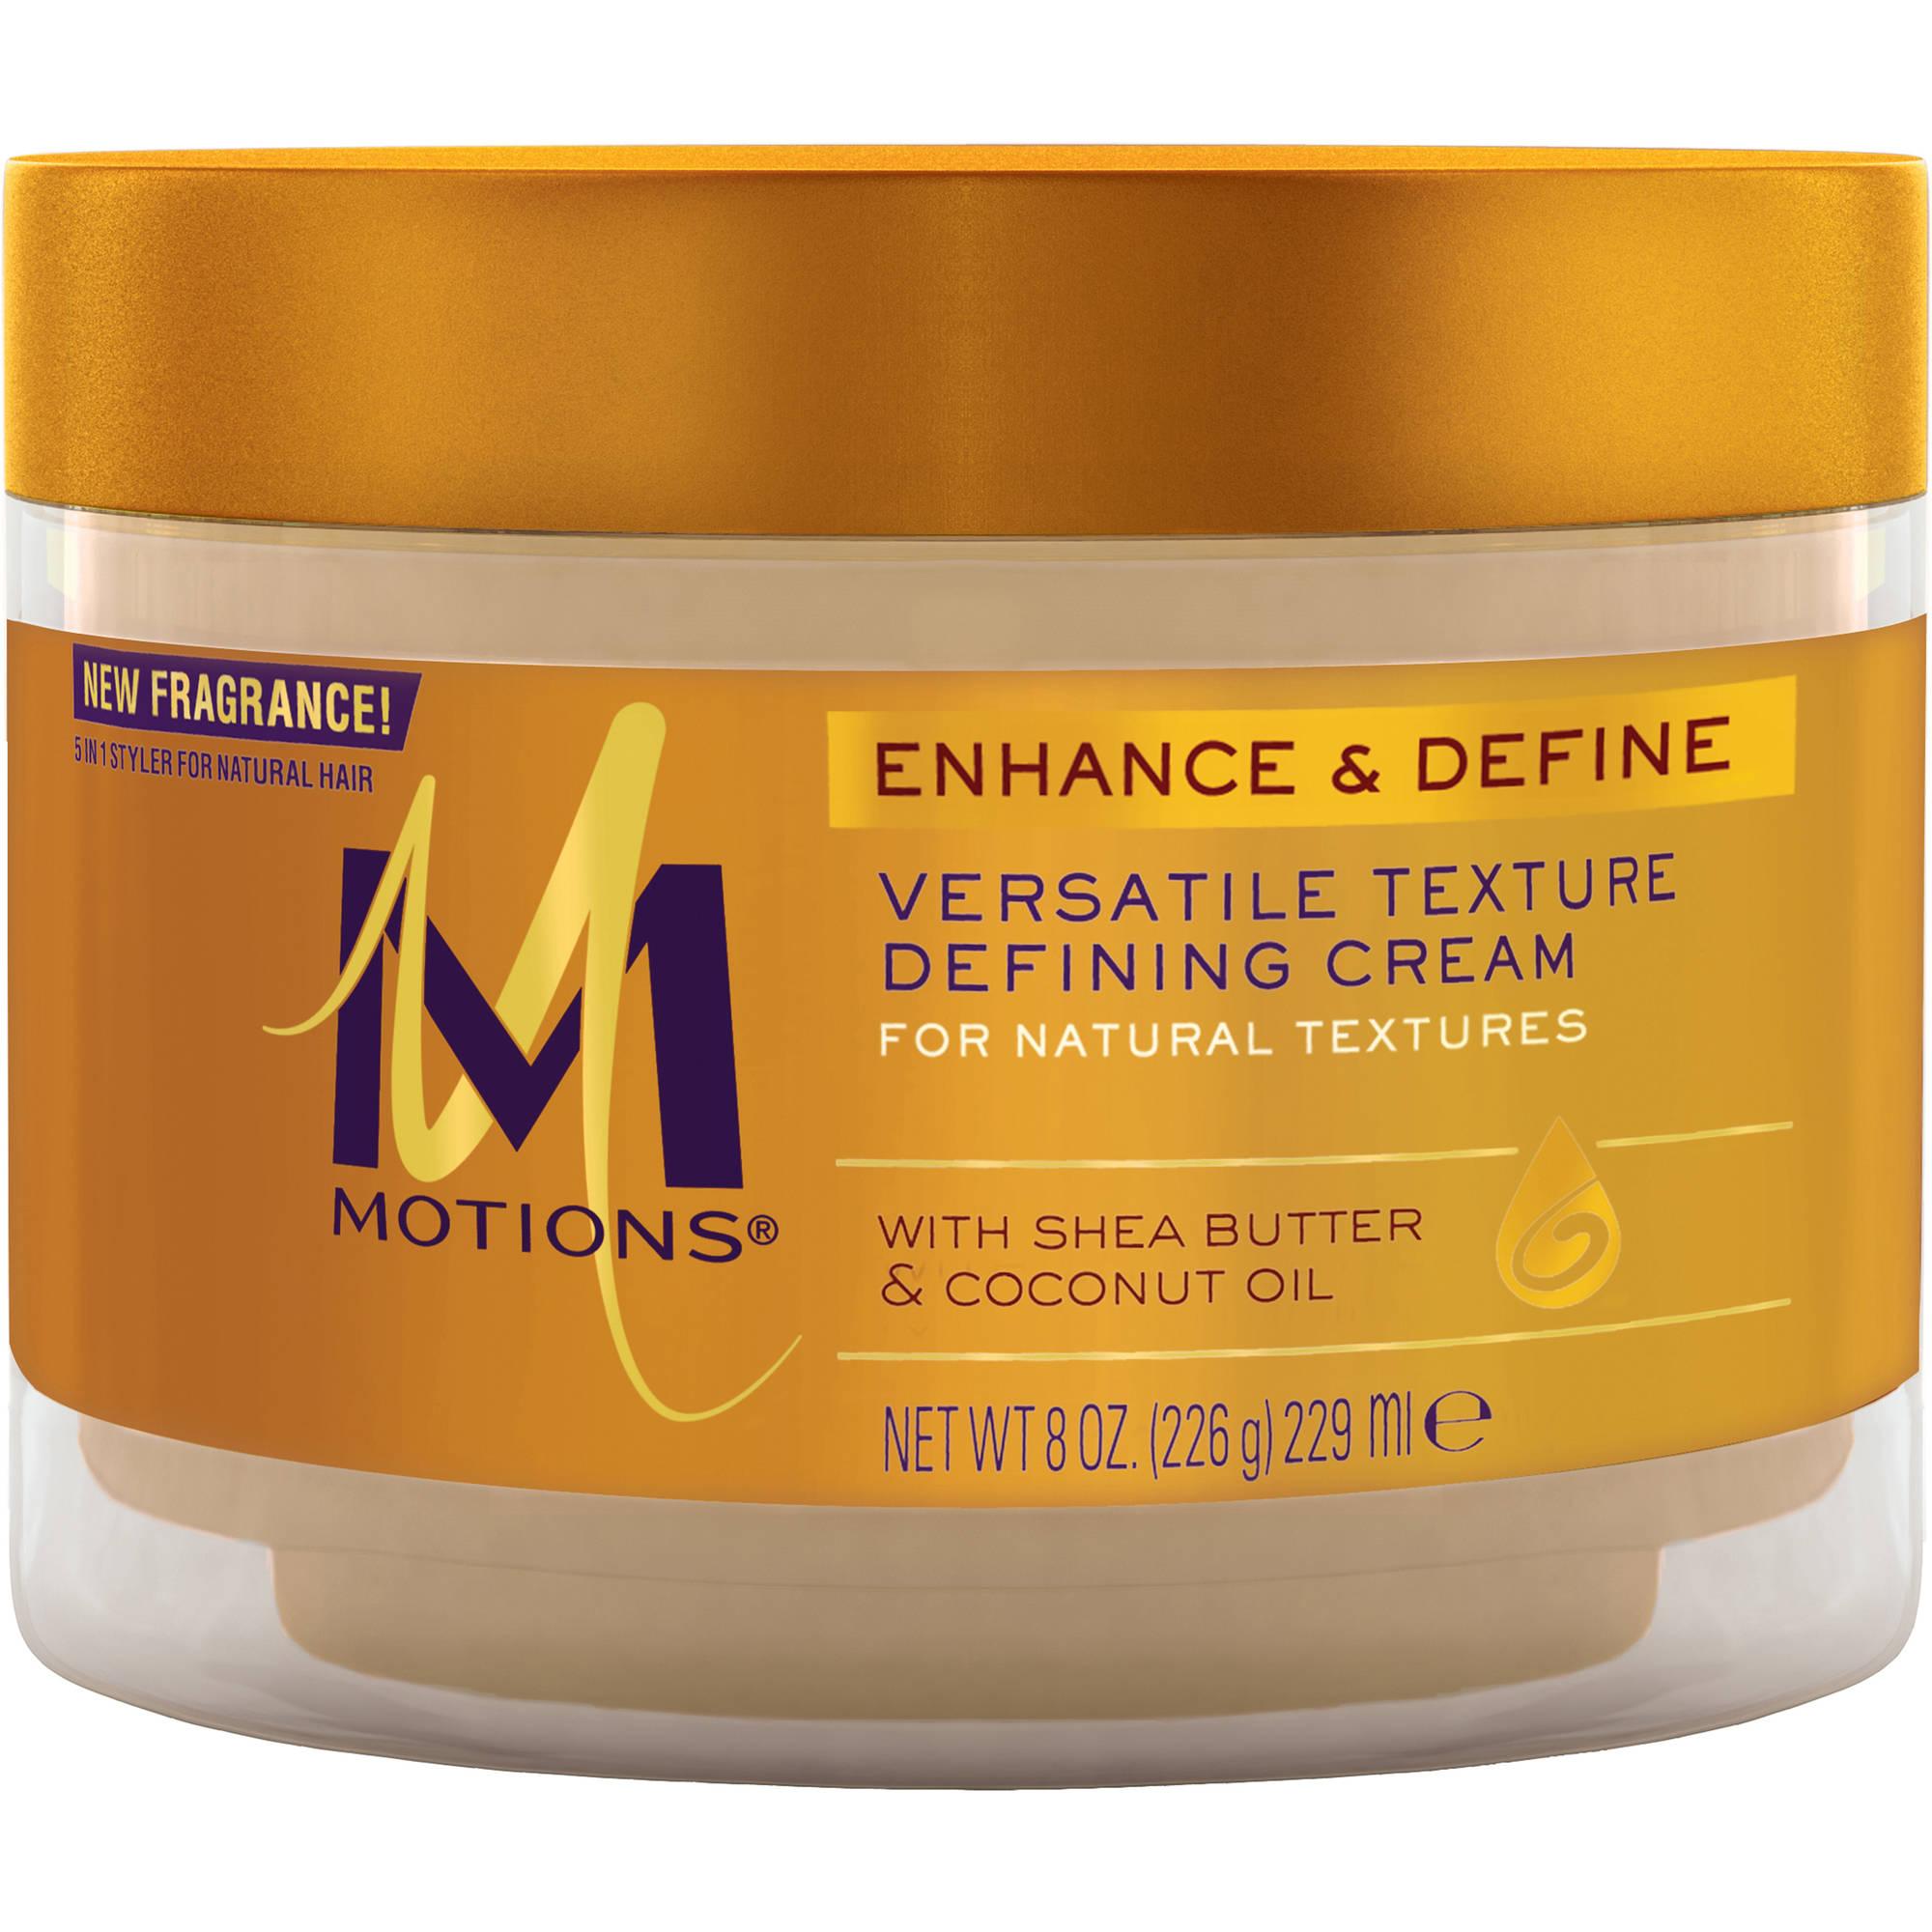 Motions Enhance and Define Versatile Texture Defining Cream, 8 oz ...